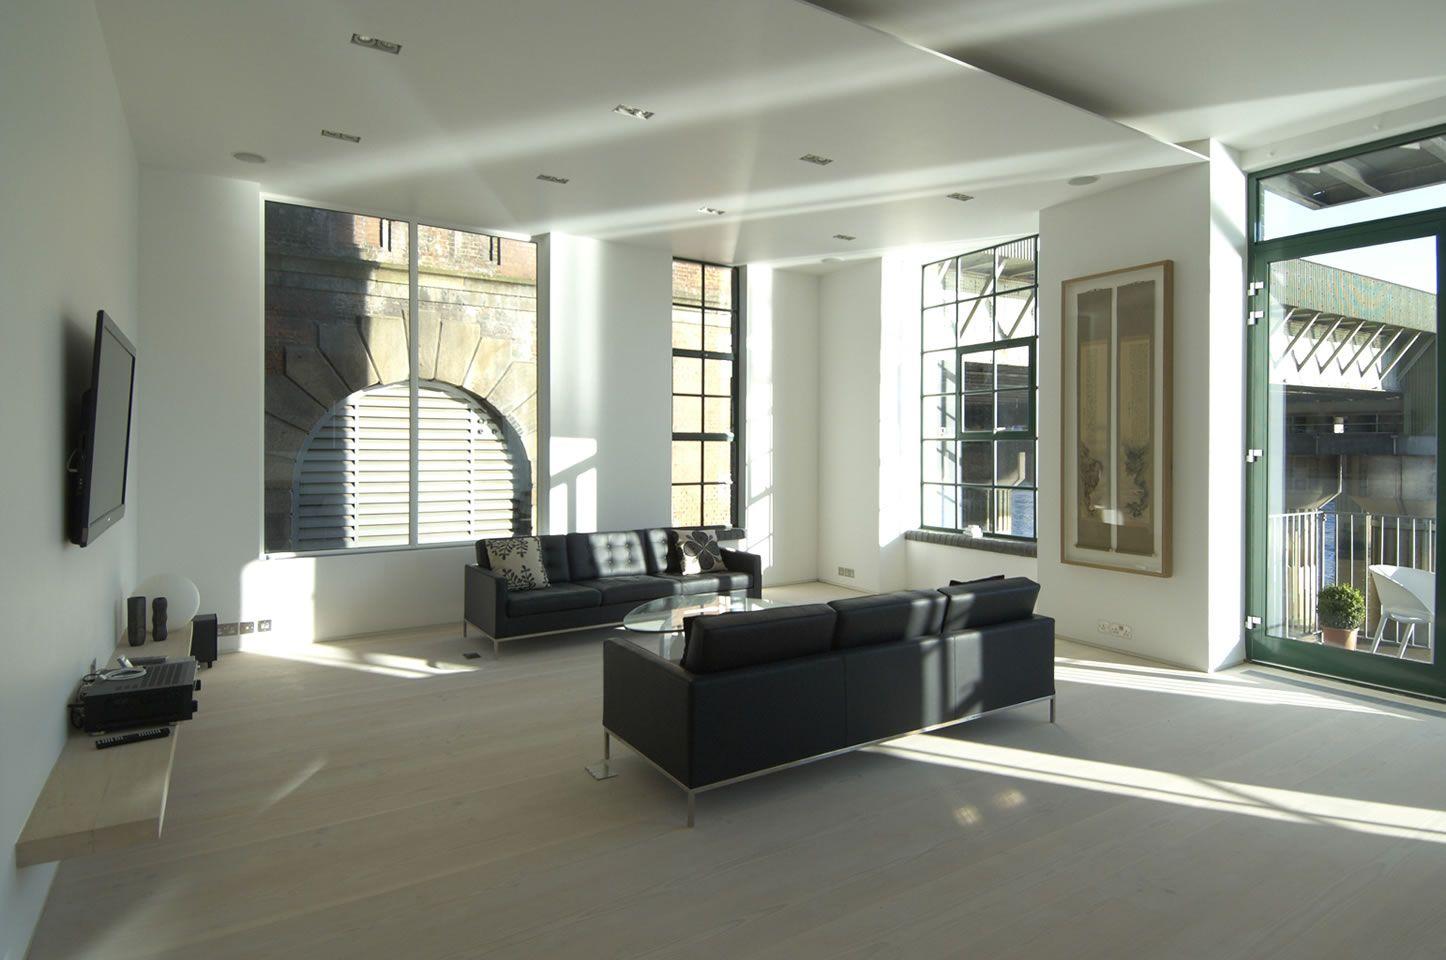 Clink street apartment london by chiara ferrari studio